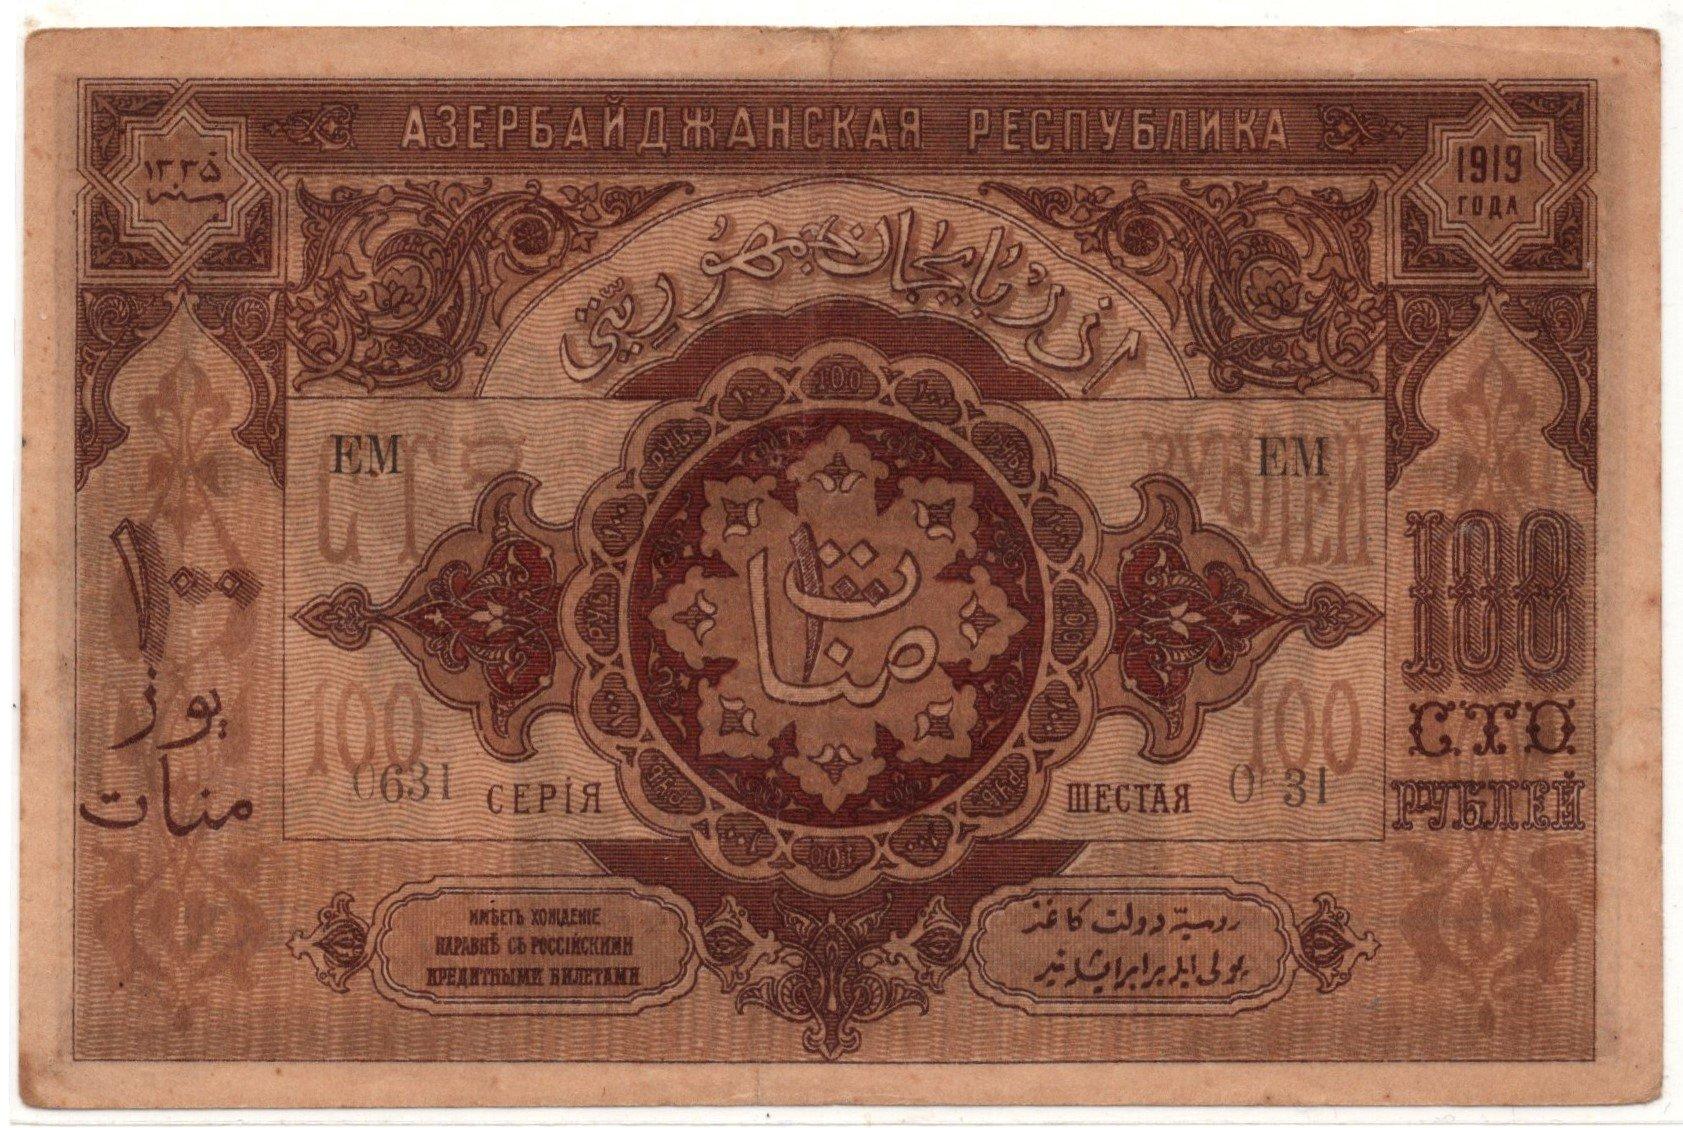 azbebaaijan 100 manat banknote